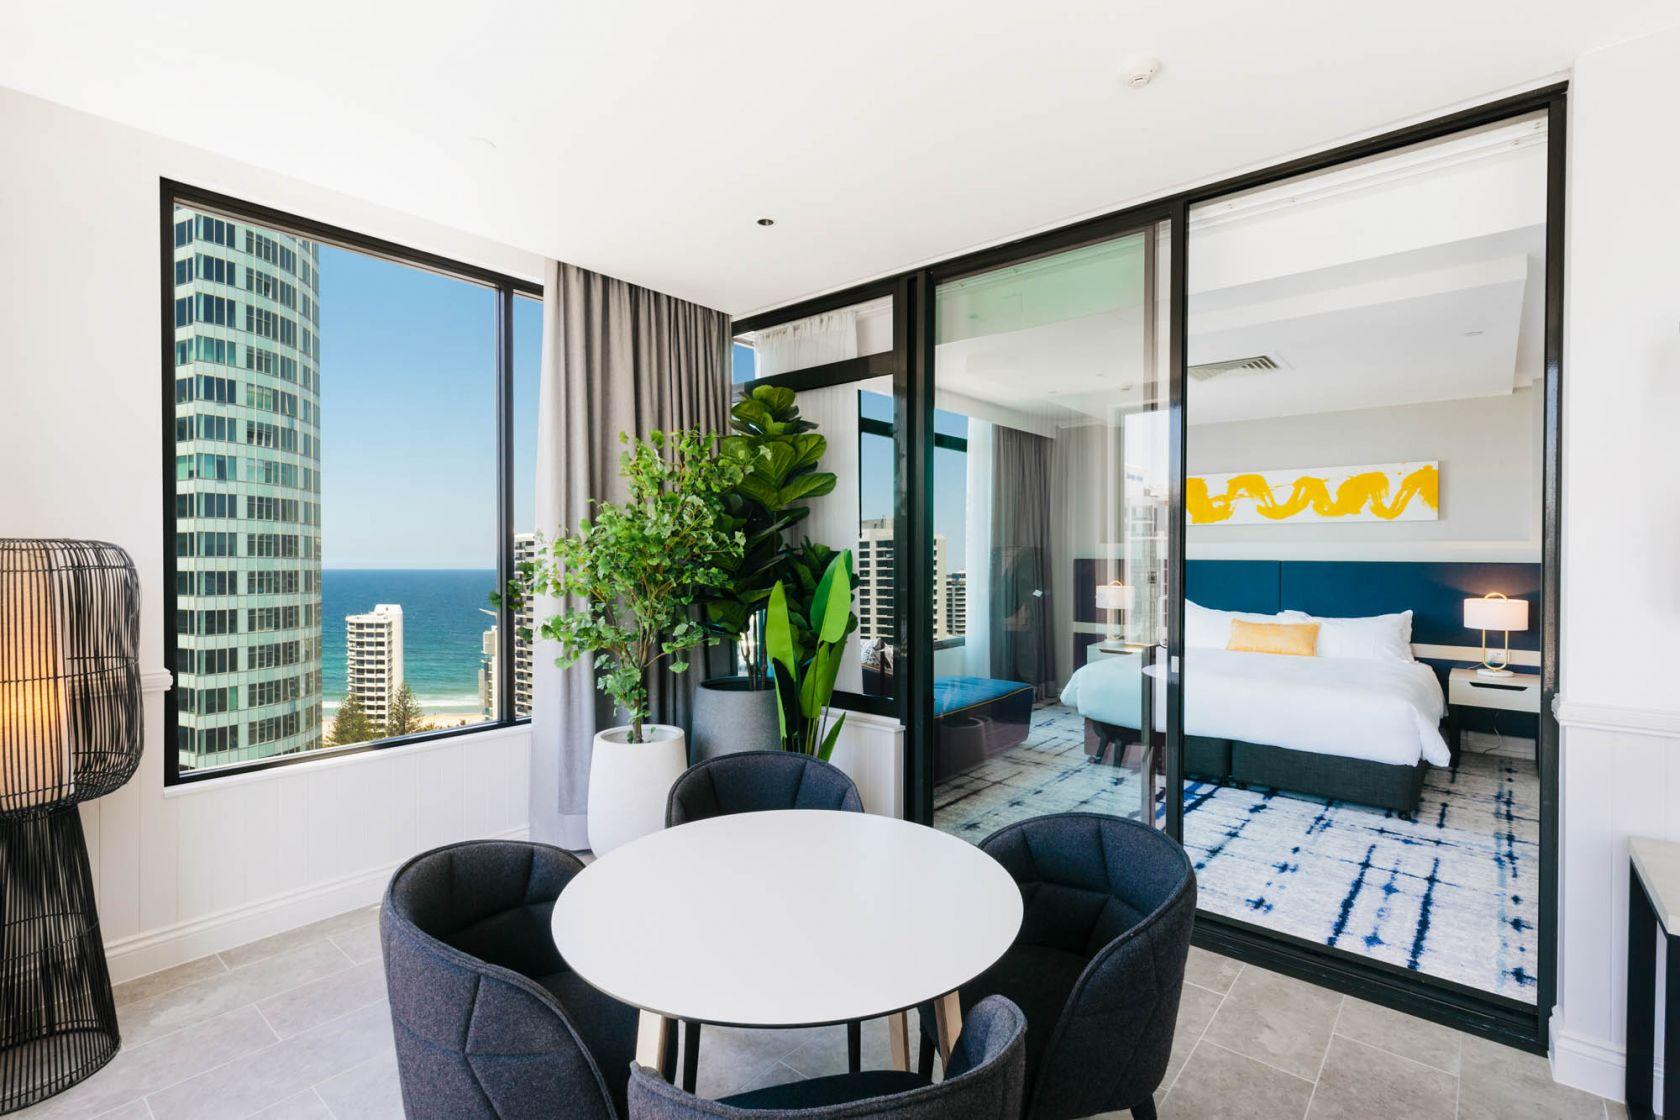 voco hotel gold coast fitout refurbishment construction executive suite terrace bedroom